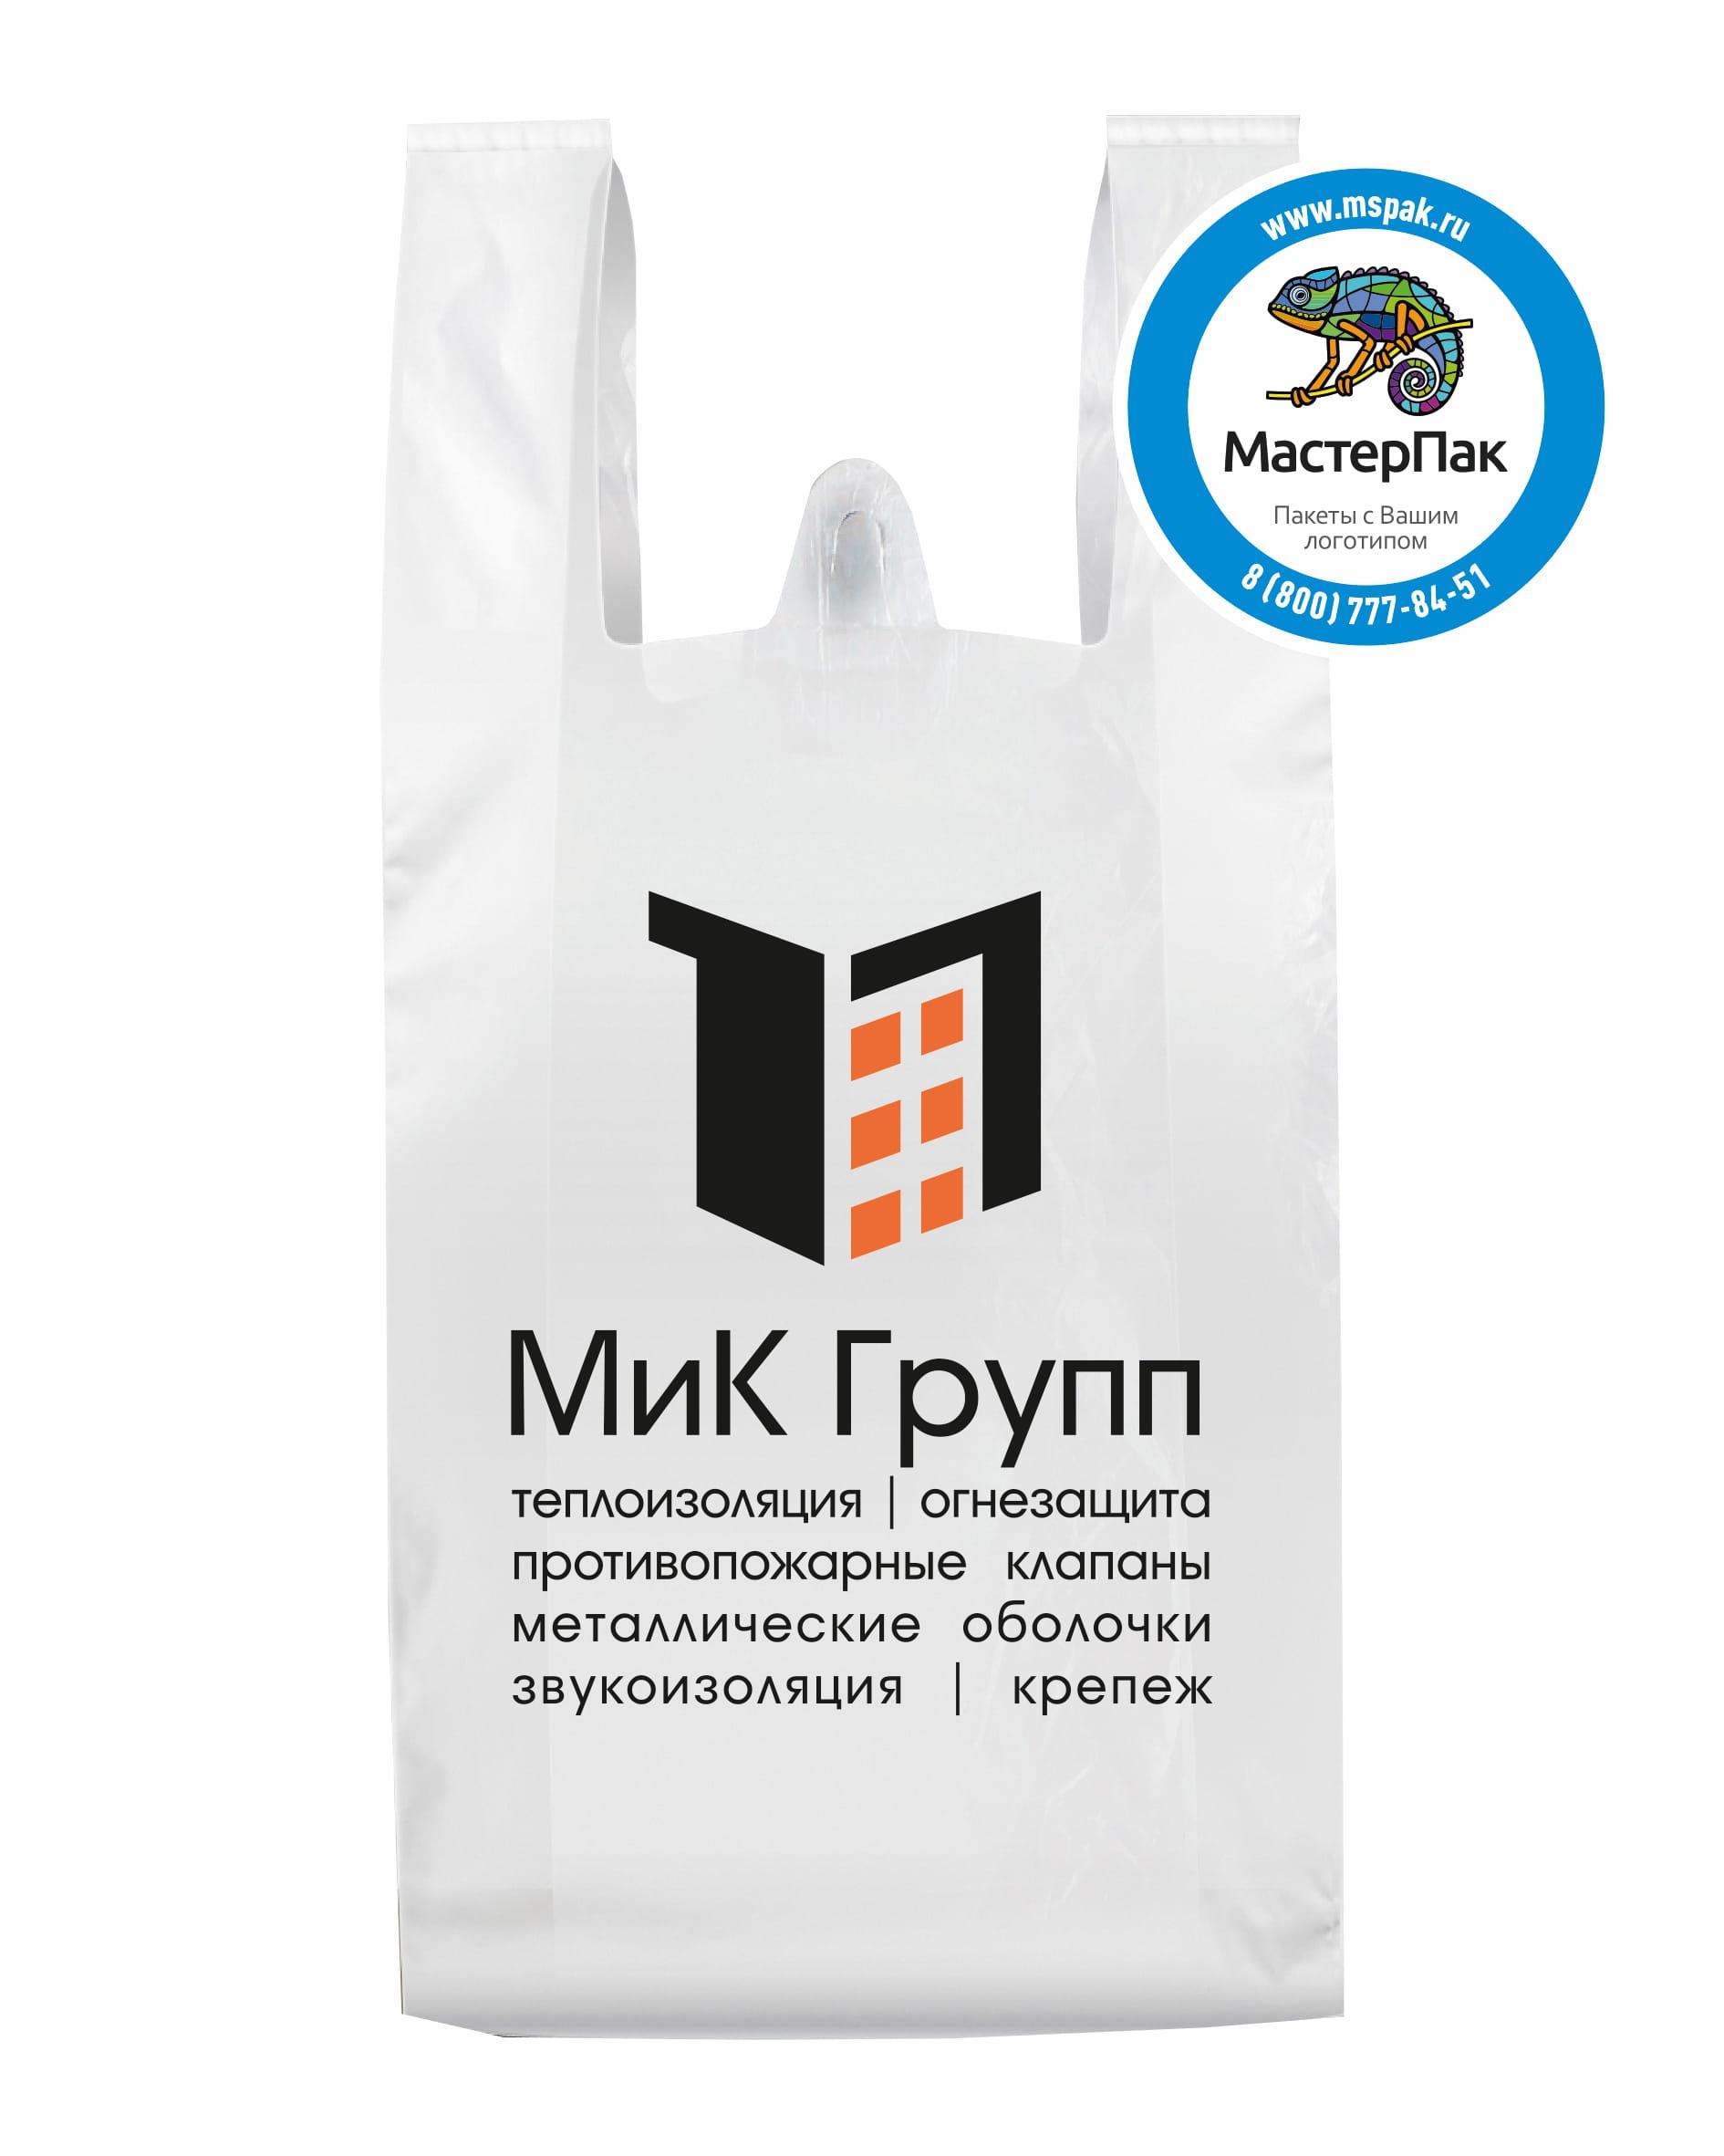 Пакет-майка ПНД с логотипом МиК Групп, 40*60, 28 мкм